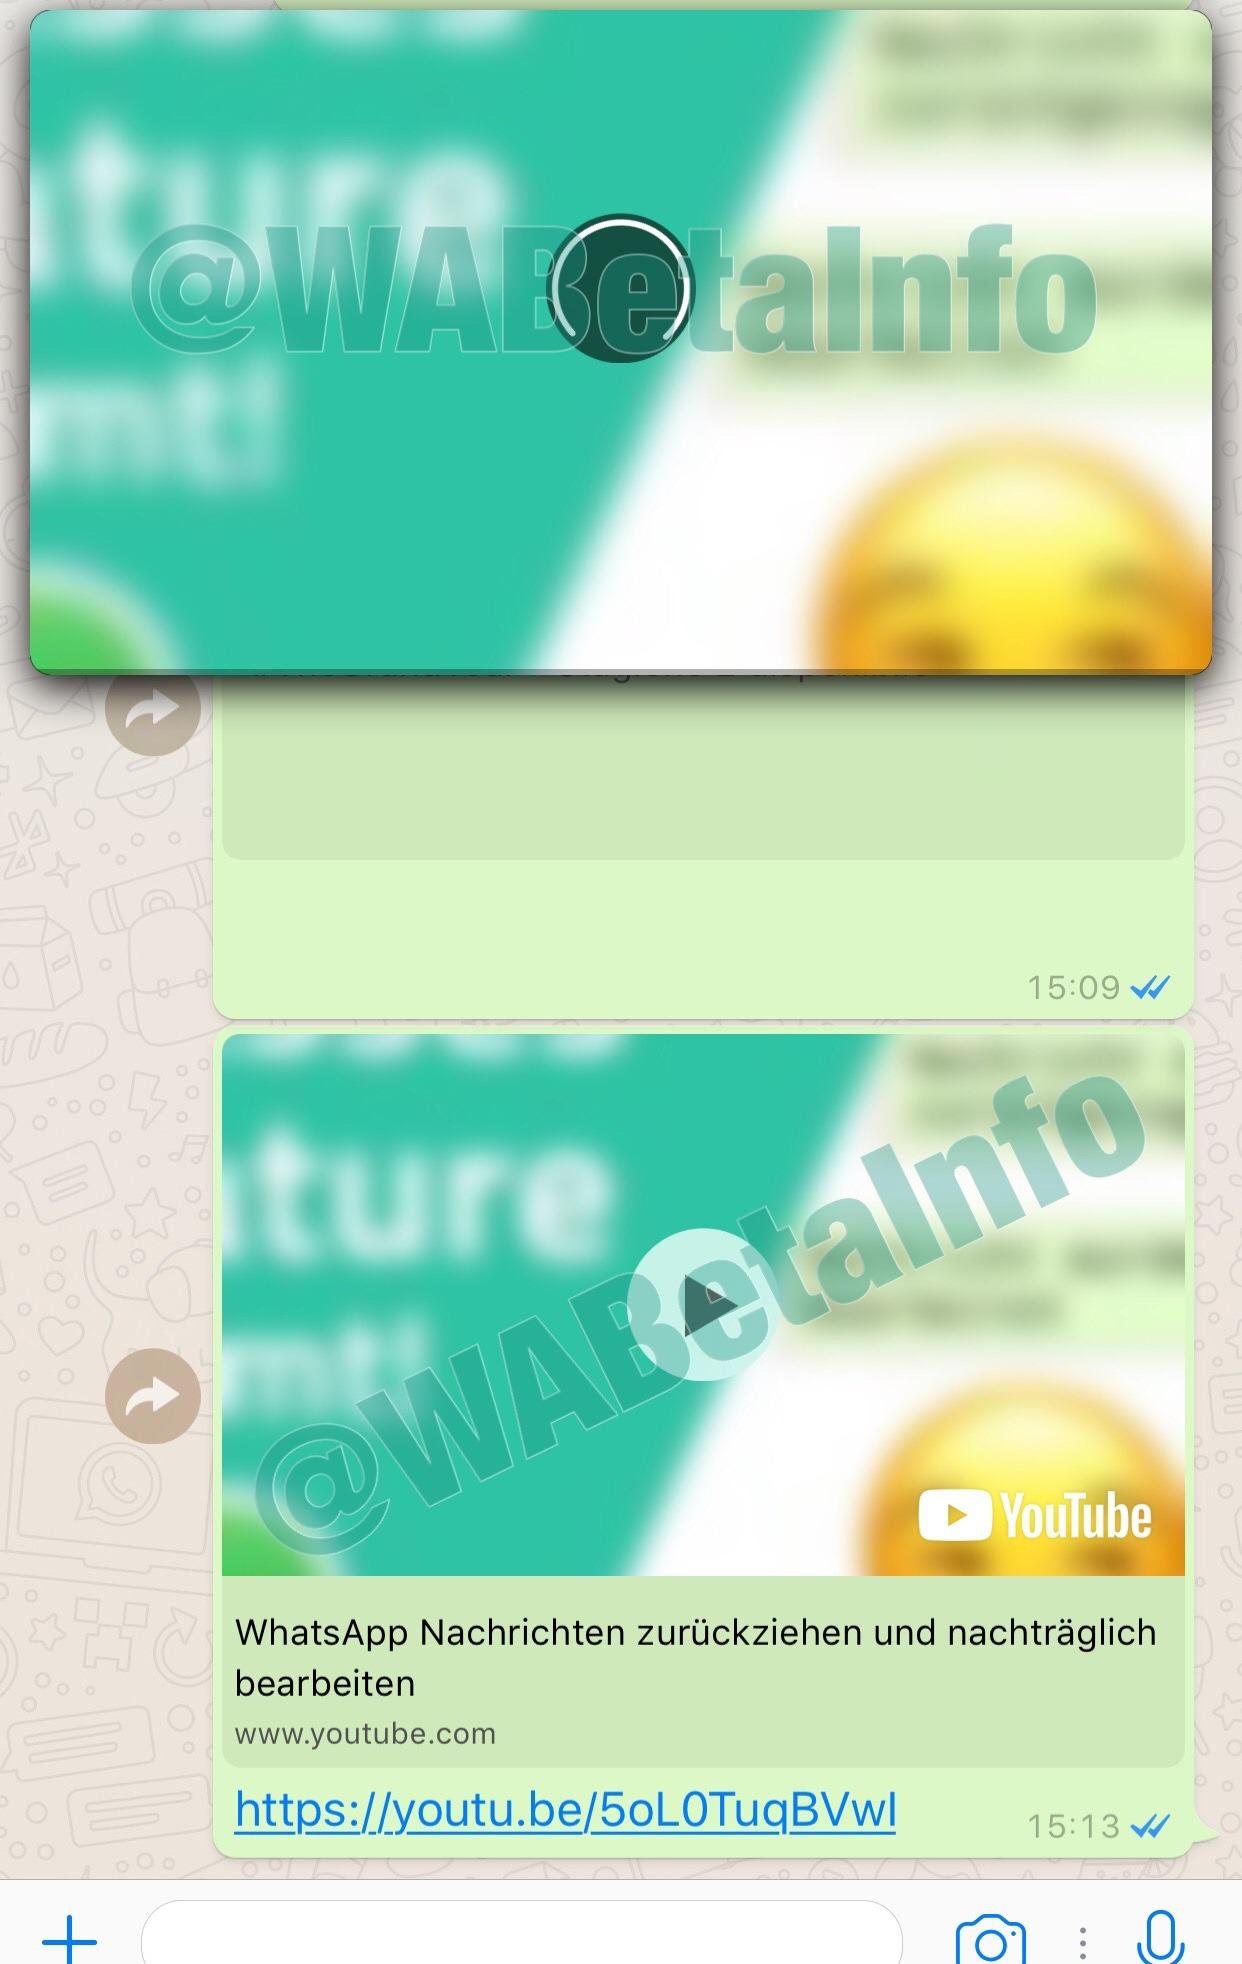 WhatsApp ventana YouTube